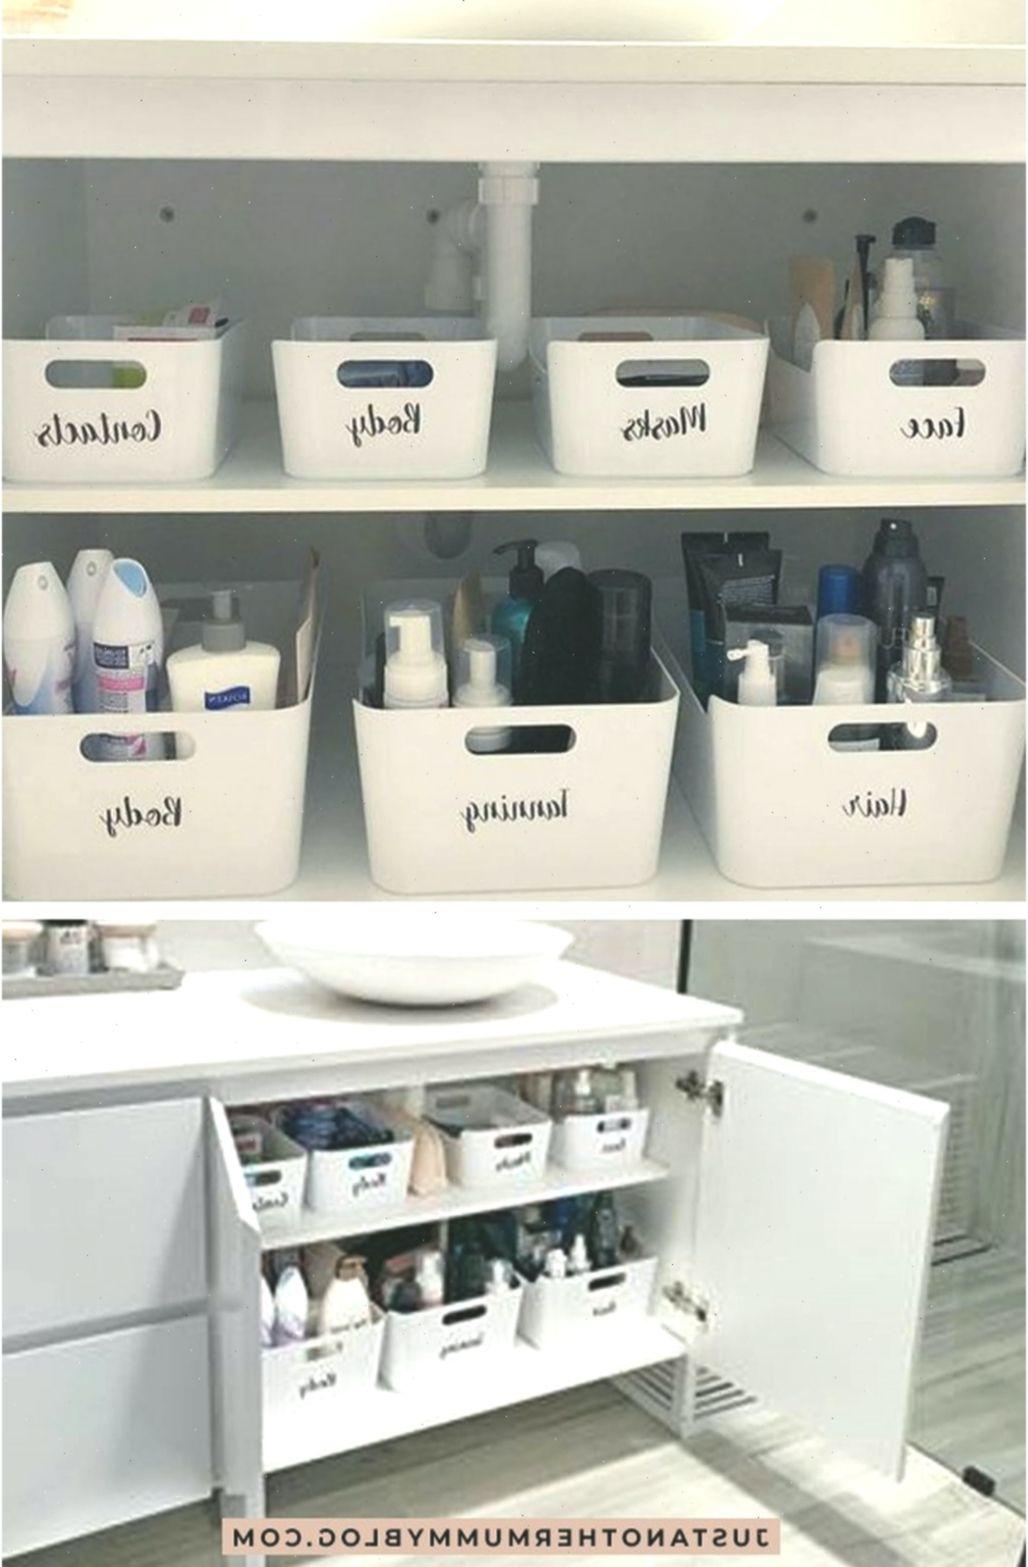 43 Minimalist Bathroom Storage Organization Ideas